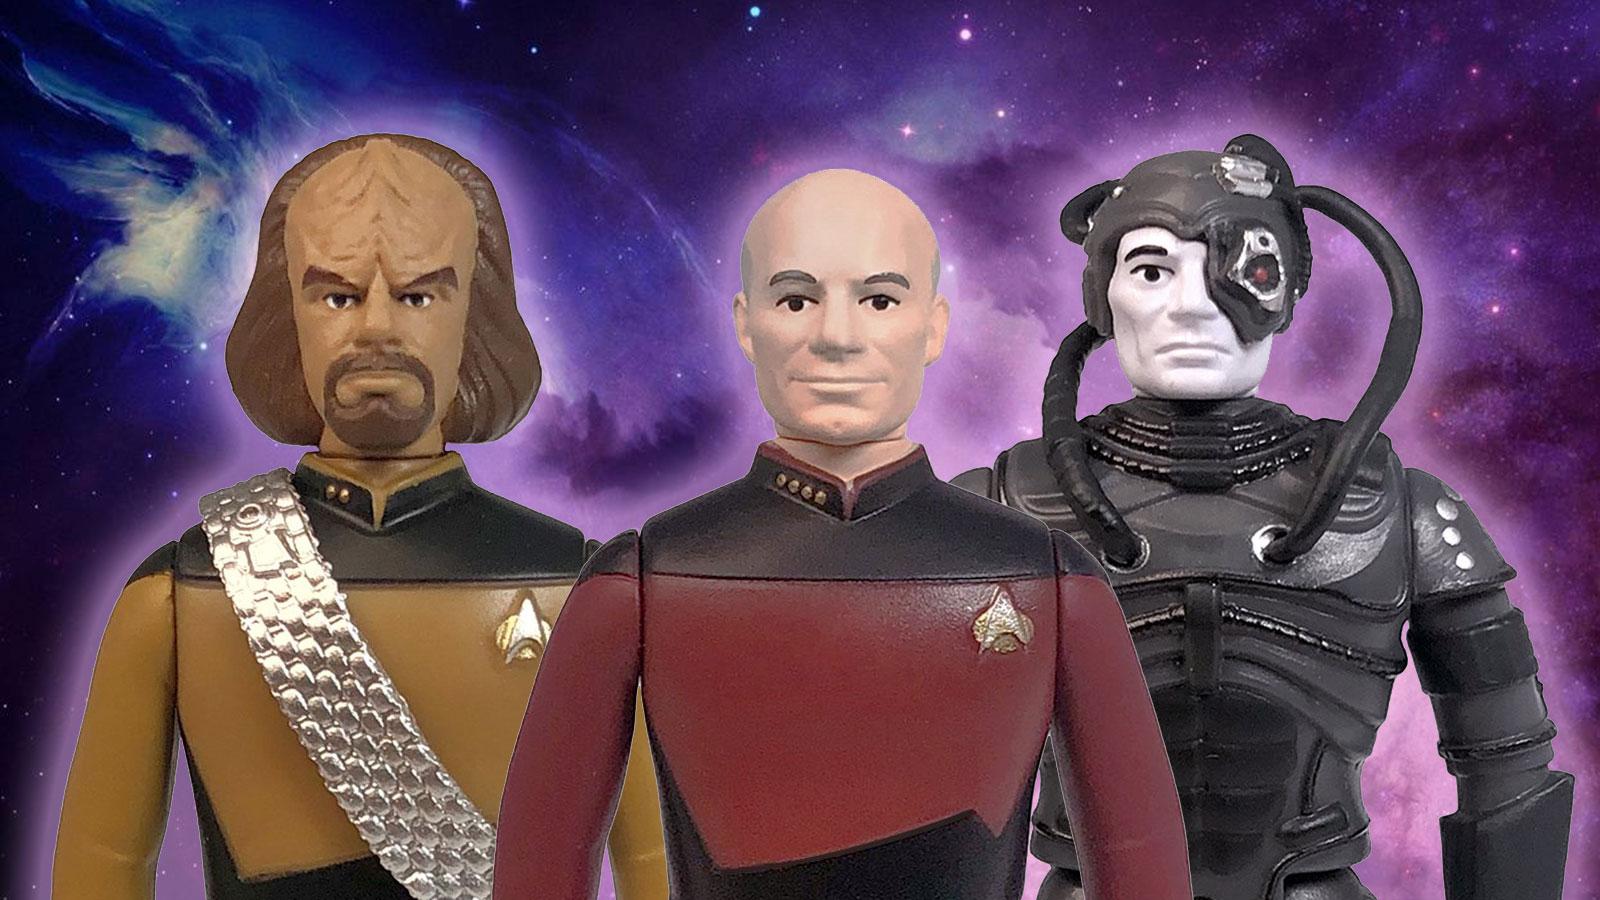 Star Trek: The Next Generation ReAction Figures Beaming Down In June